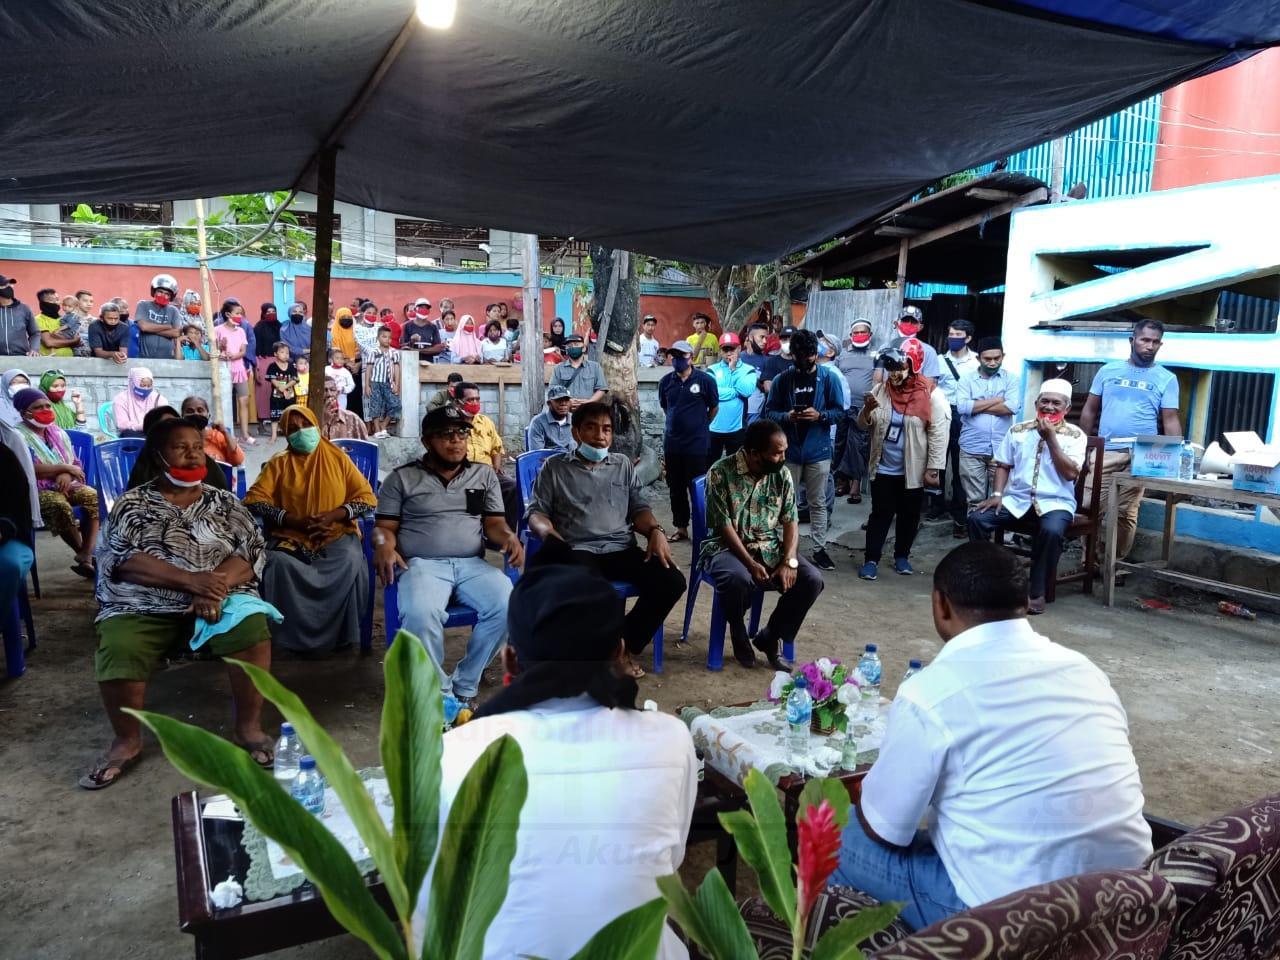 Komunitas Nelayan Borobudur Nyatakan Dukung HEBO di Pilkada Manokwari 2020 16 IMG 20201003 WA0007